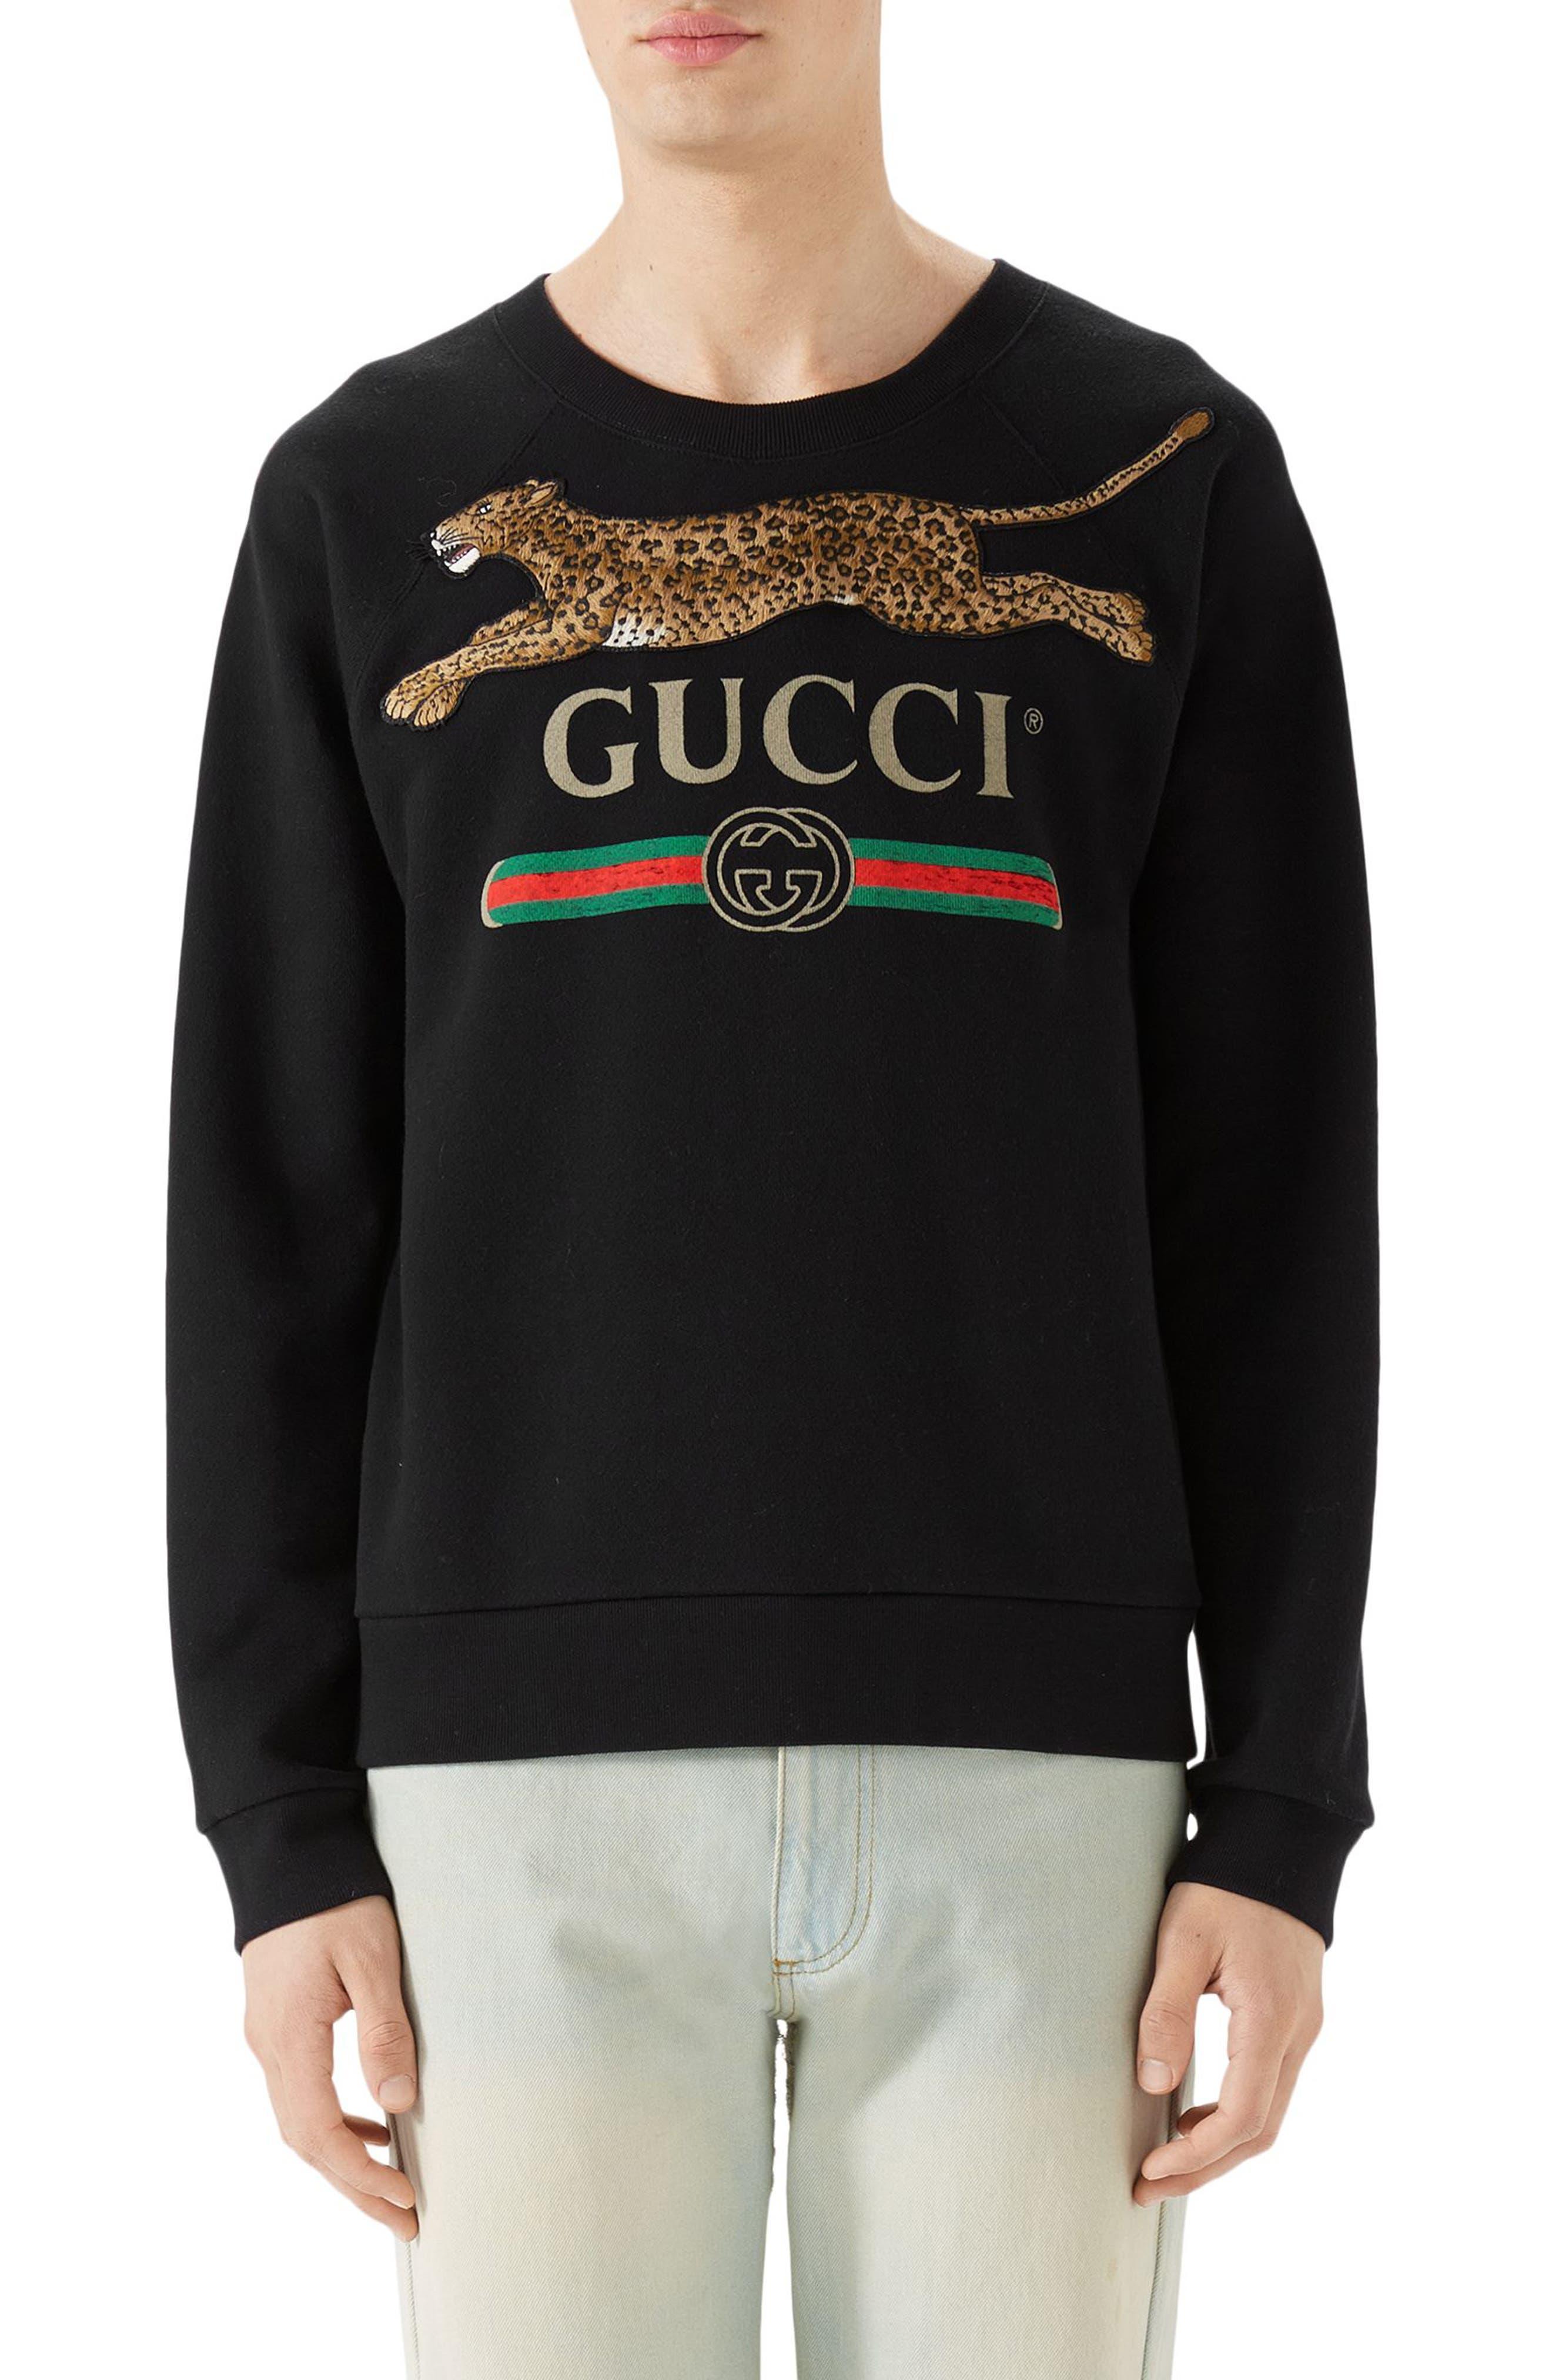 Gucci Cheetah Appliqué Logo Sweatshirt